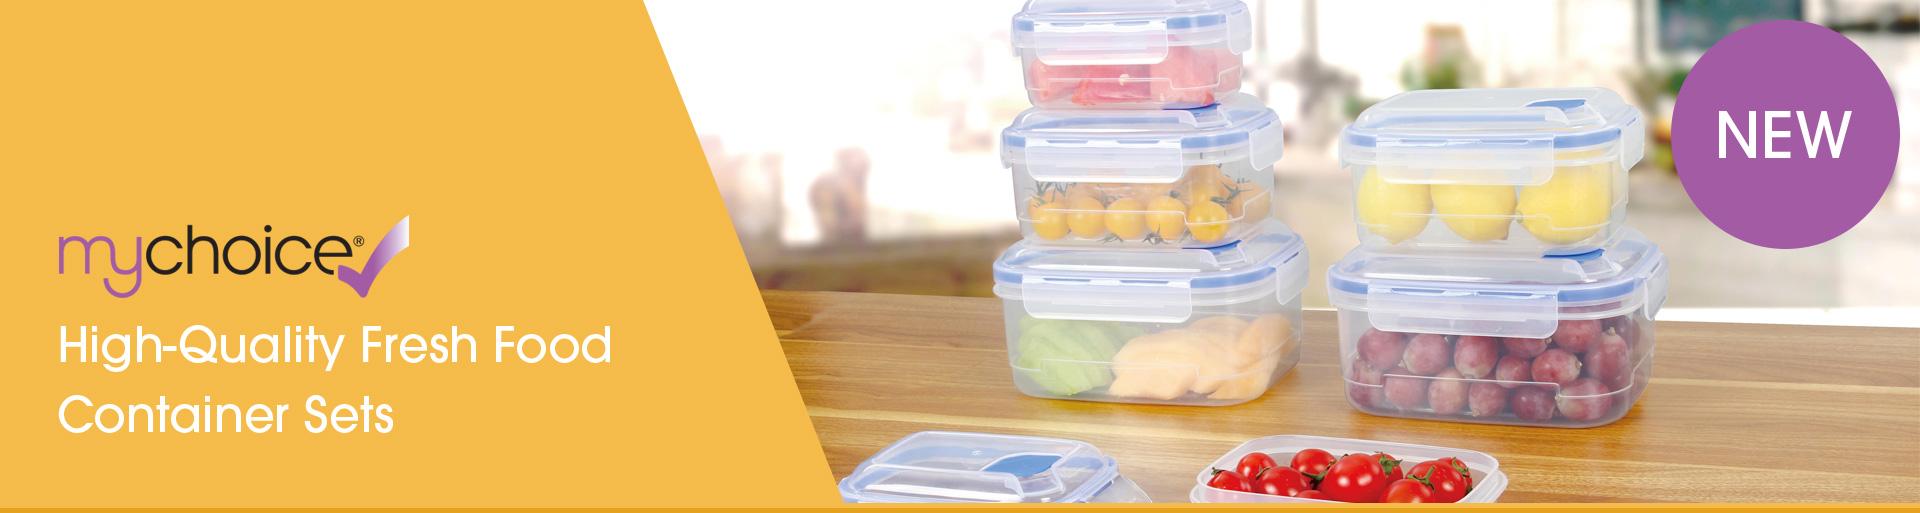 mychoice fresh food container sets